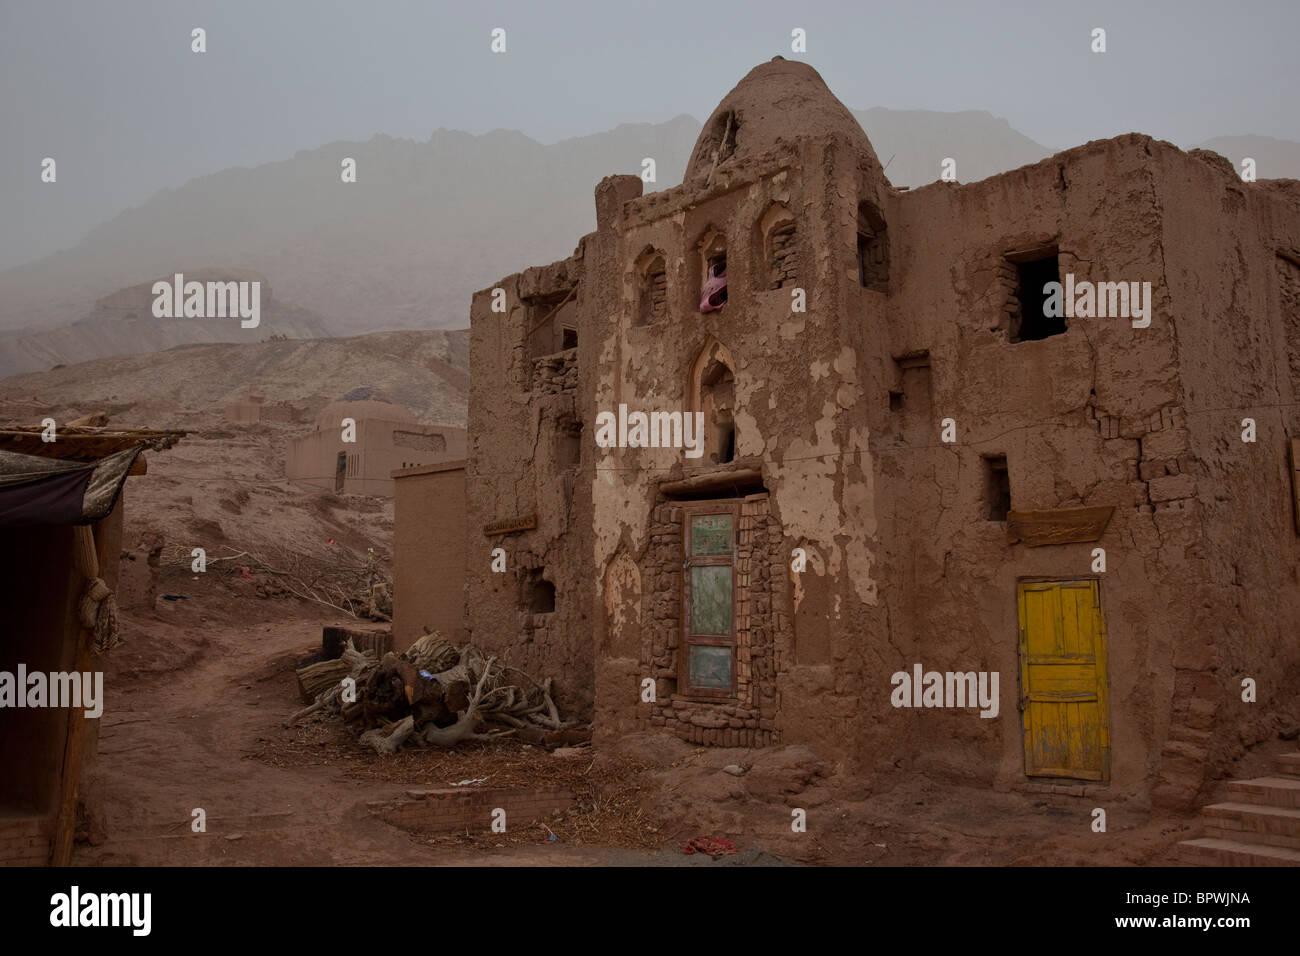 Mountain village of Toyuq, Xinjiang, China. - Stock Image